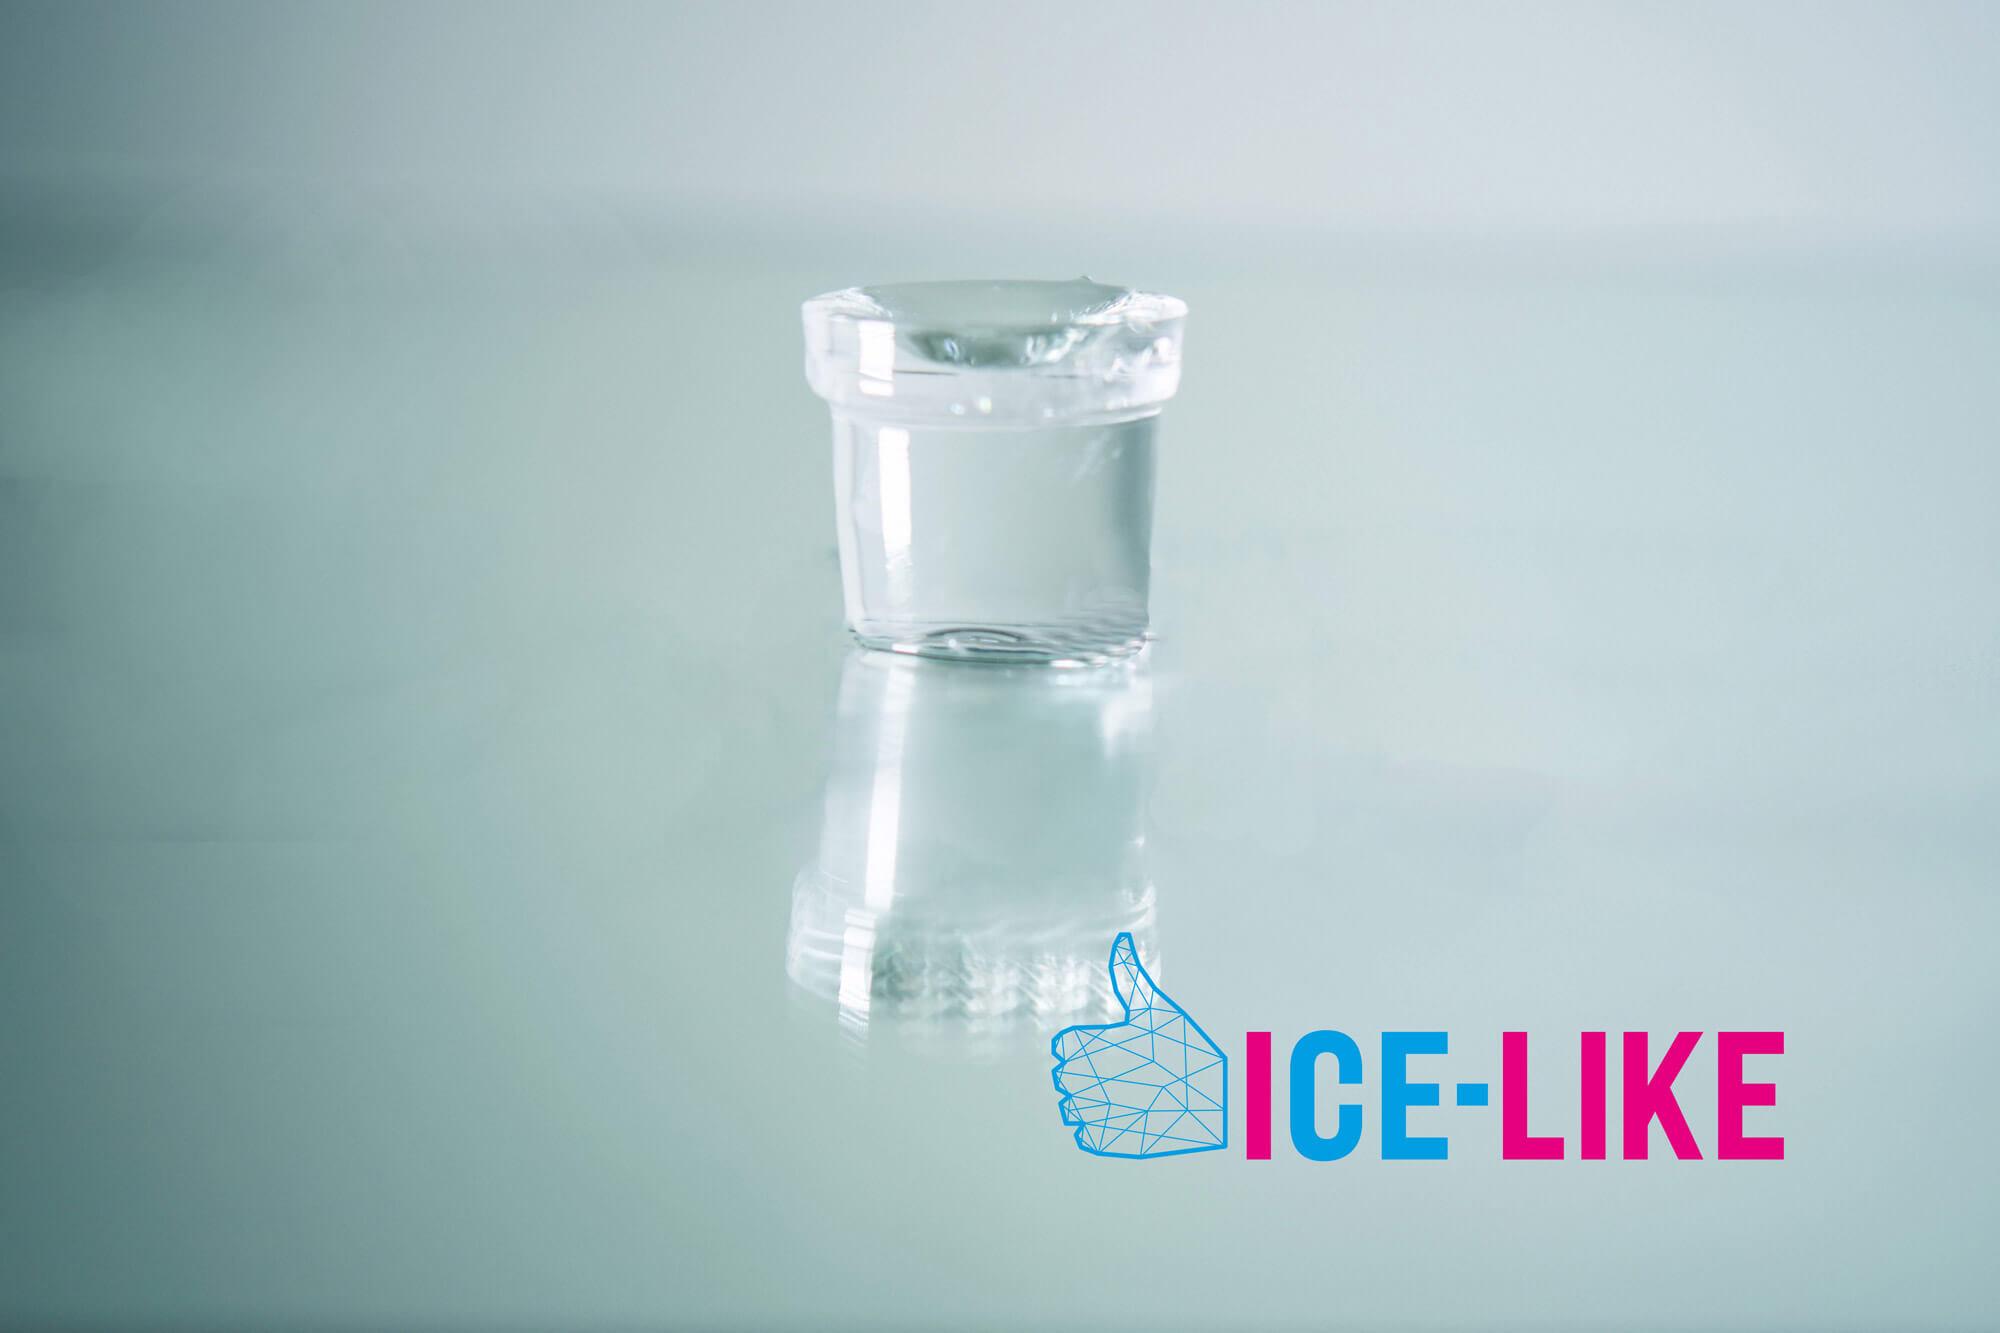 Ghiaccio alimentare IceLike Gourmet 20g-1.5kg